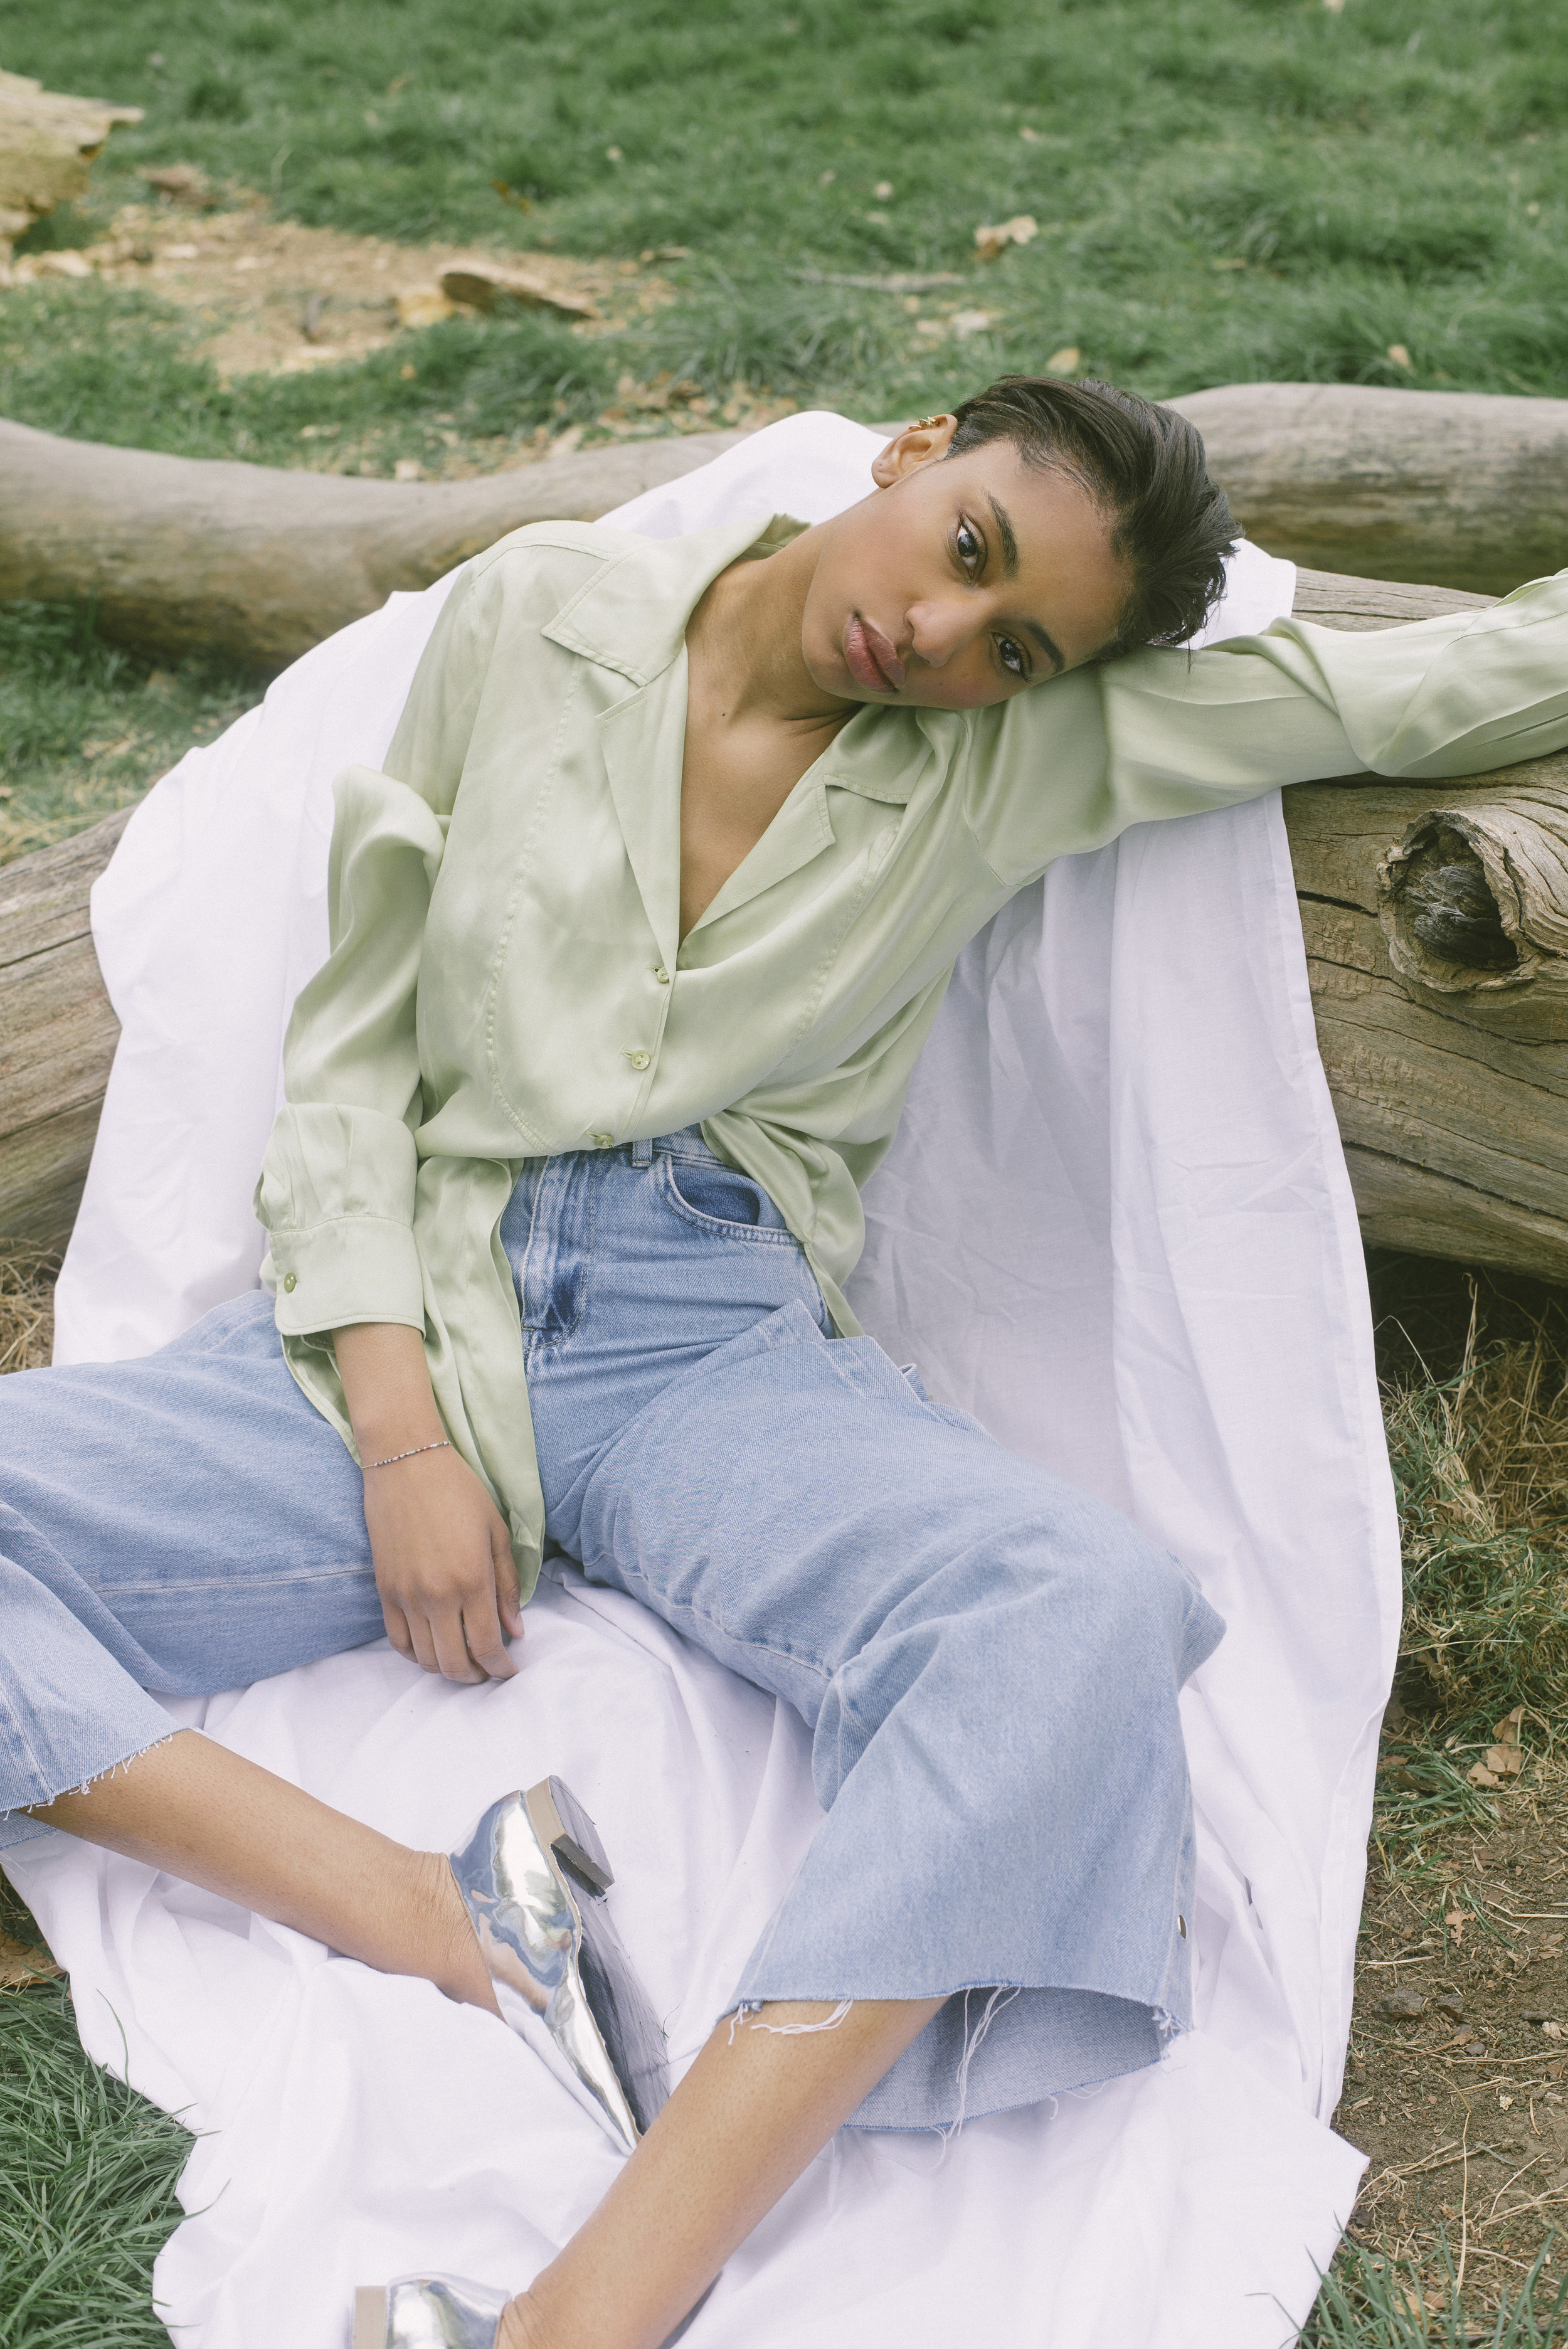 blouse VINTAGE, jeans PULL & BEAR, shoes ASOS